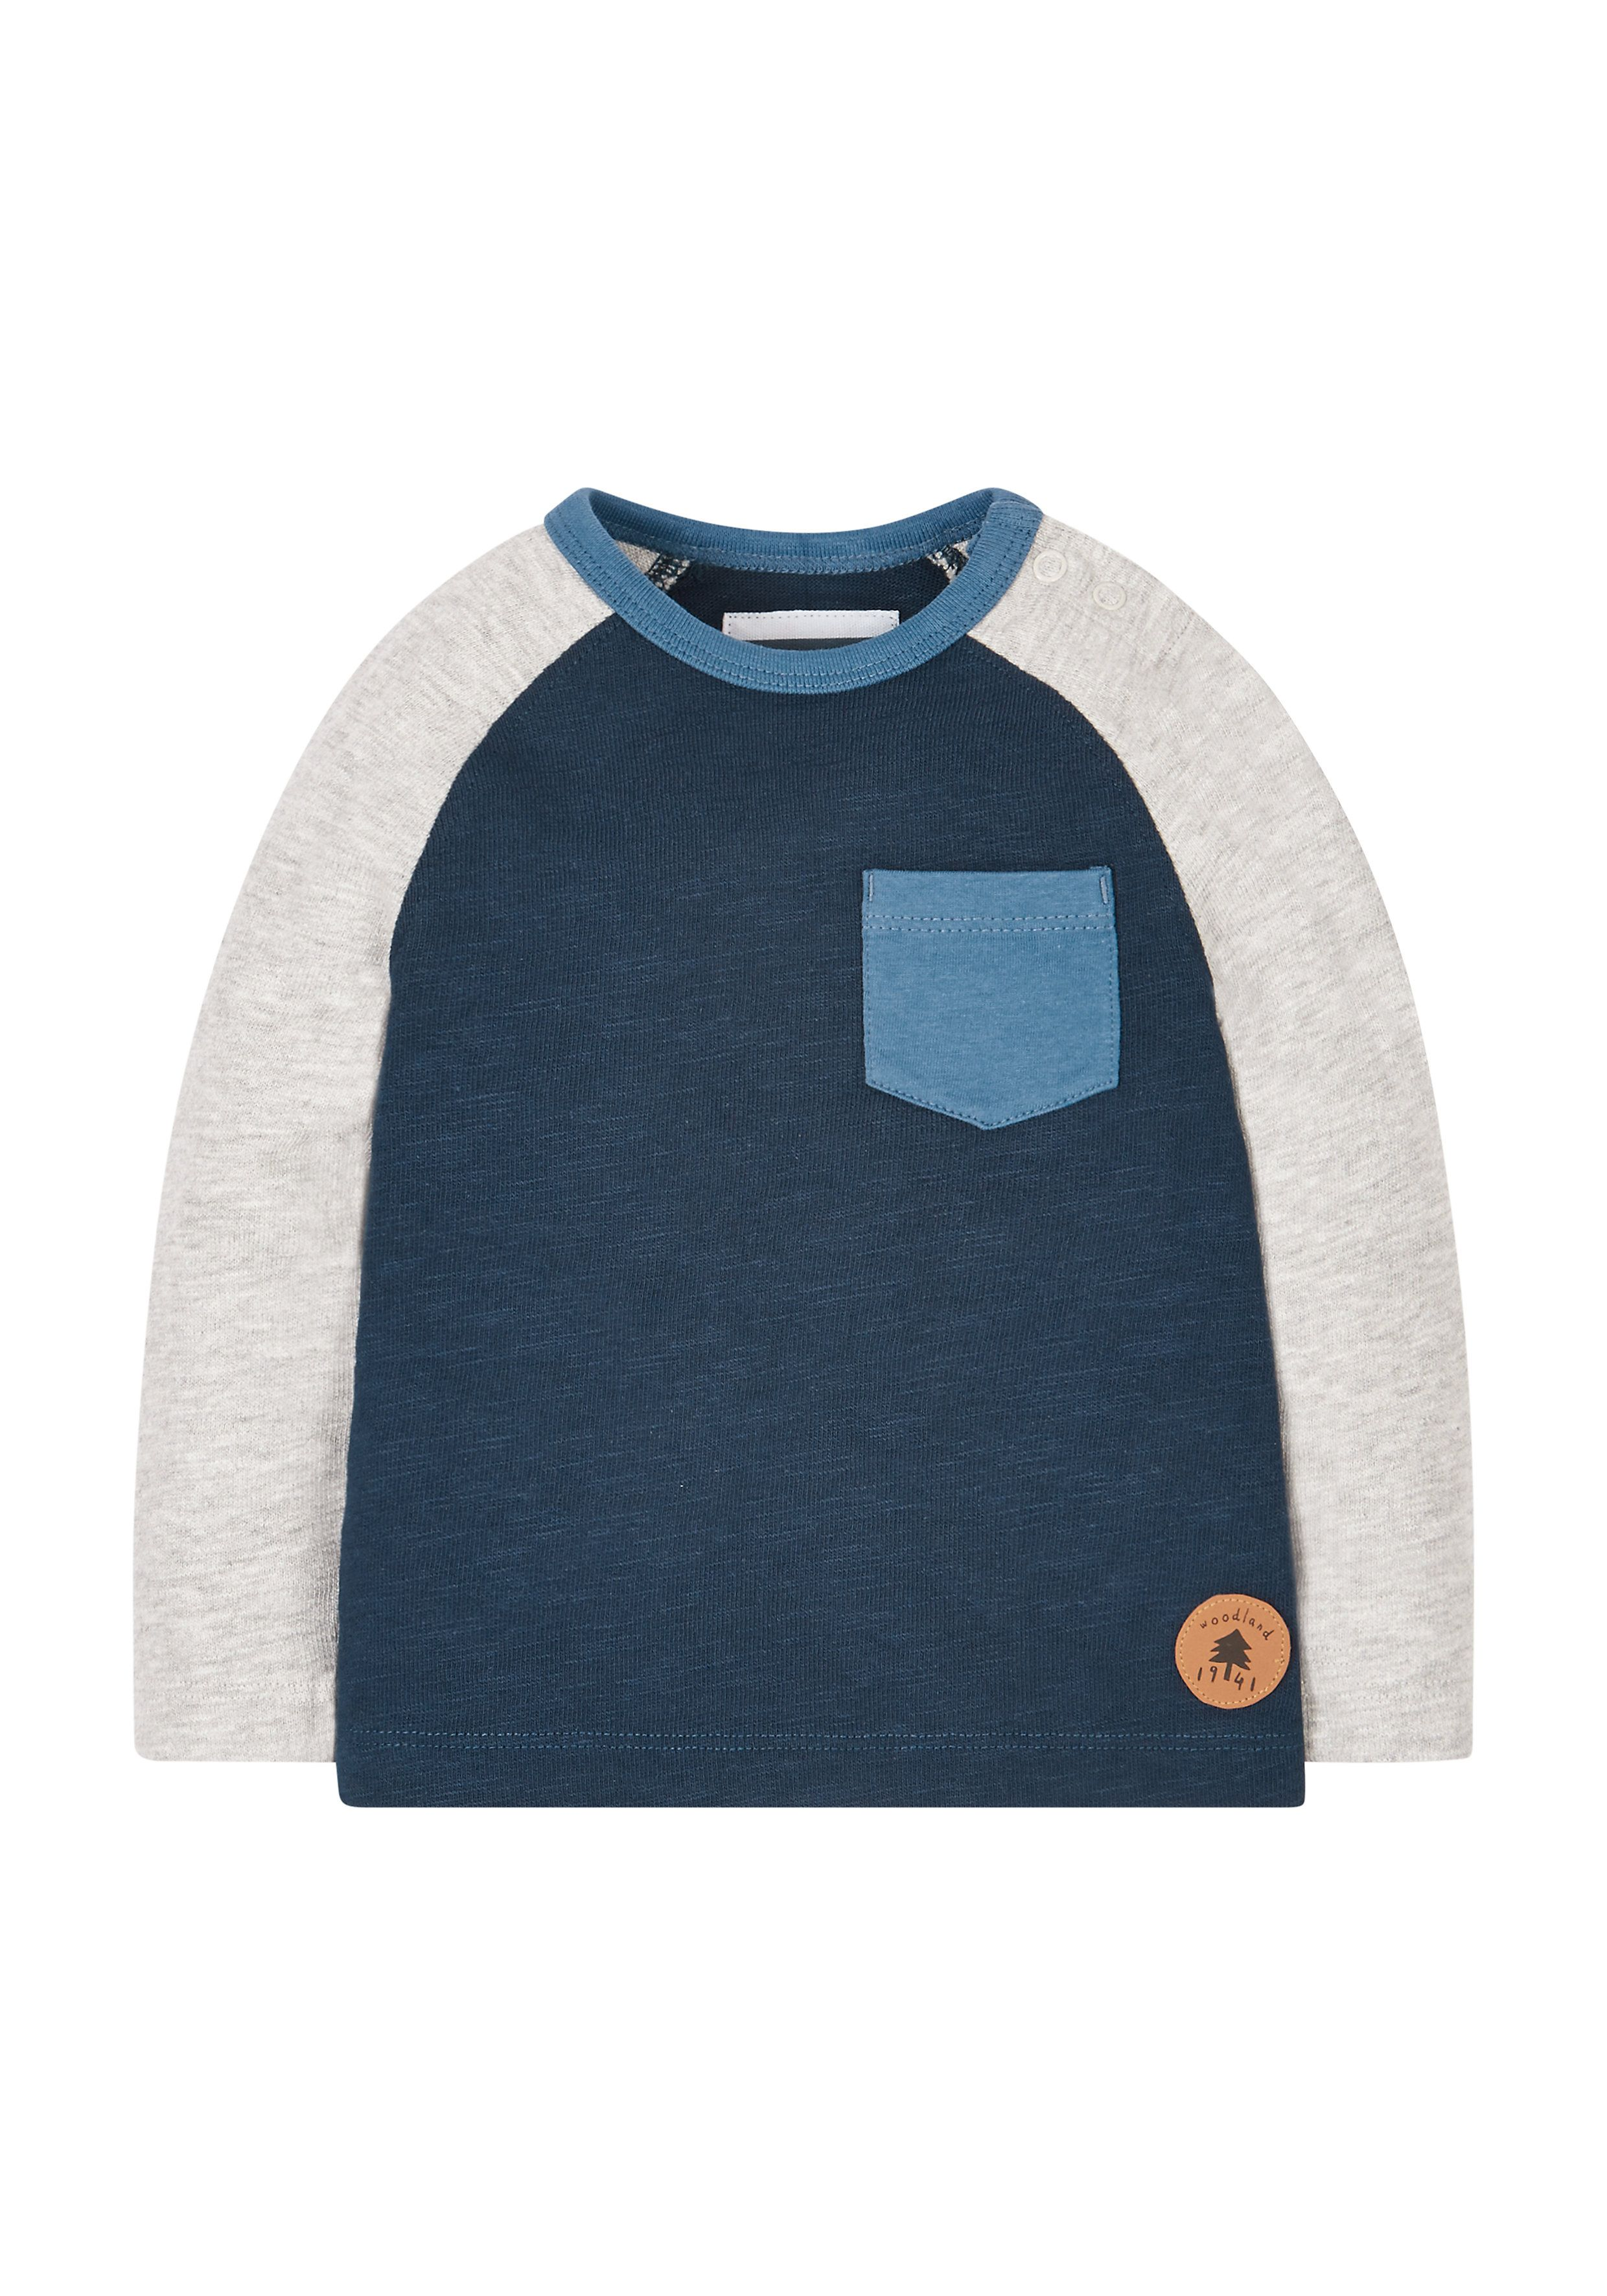 Mothercare   Navy And Grey Raglan T-Shirt